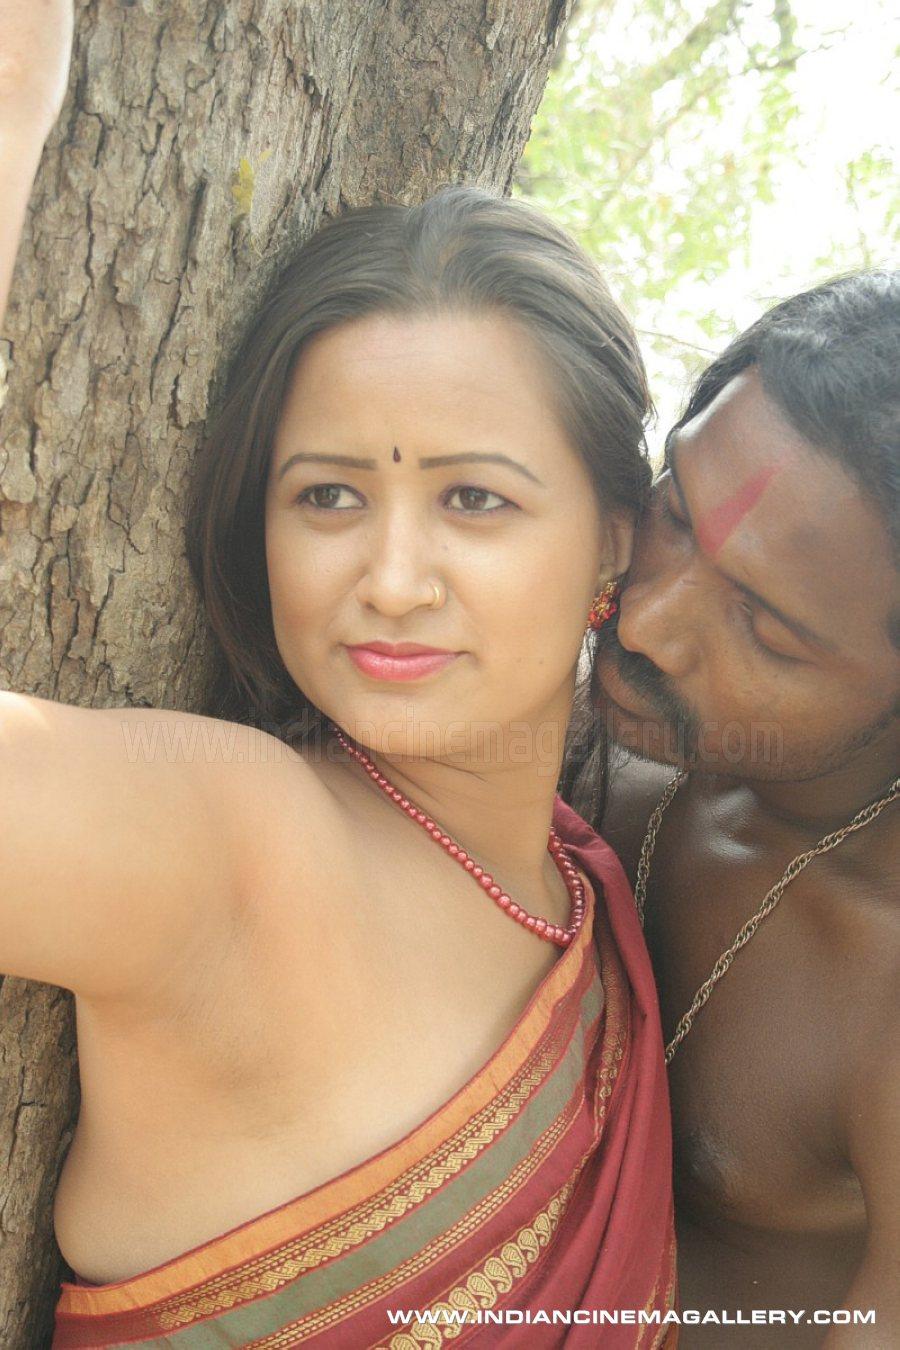 Gsv Pics - Photos With Poetry Tamil Mallu Aunty Romance -1641